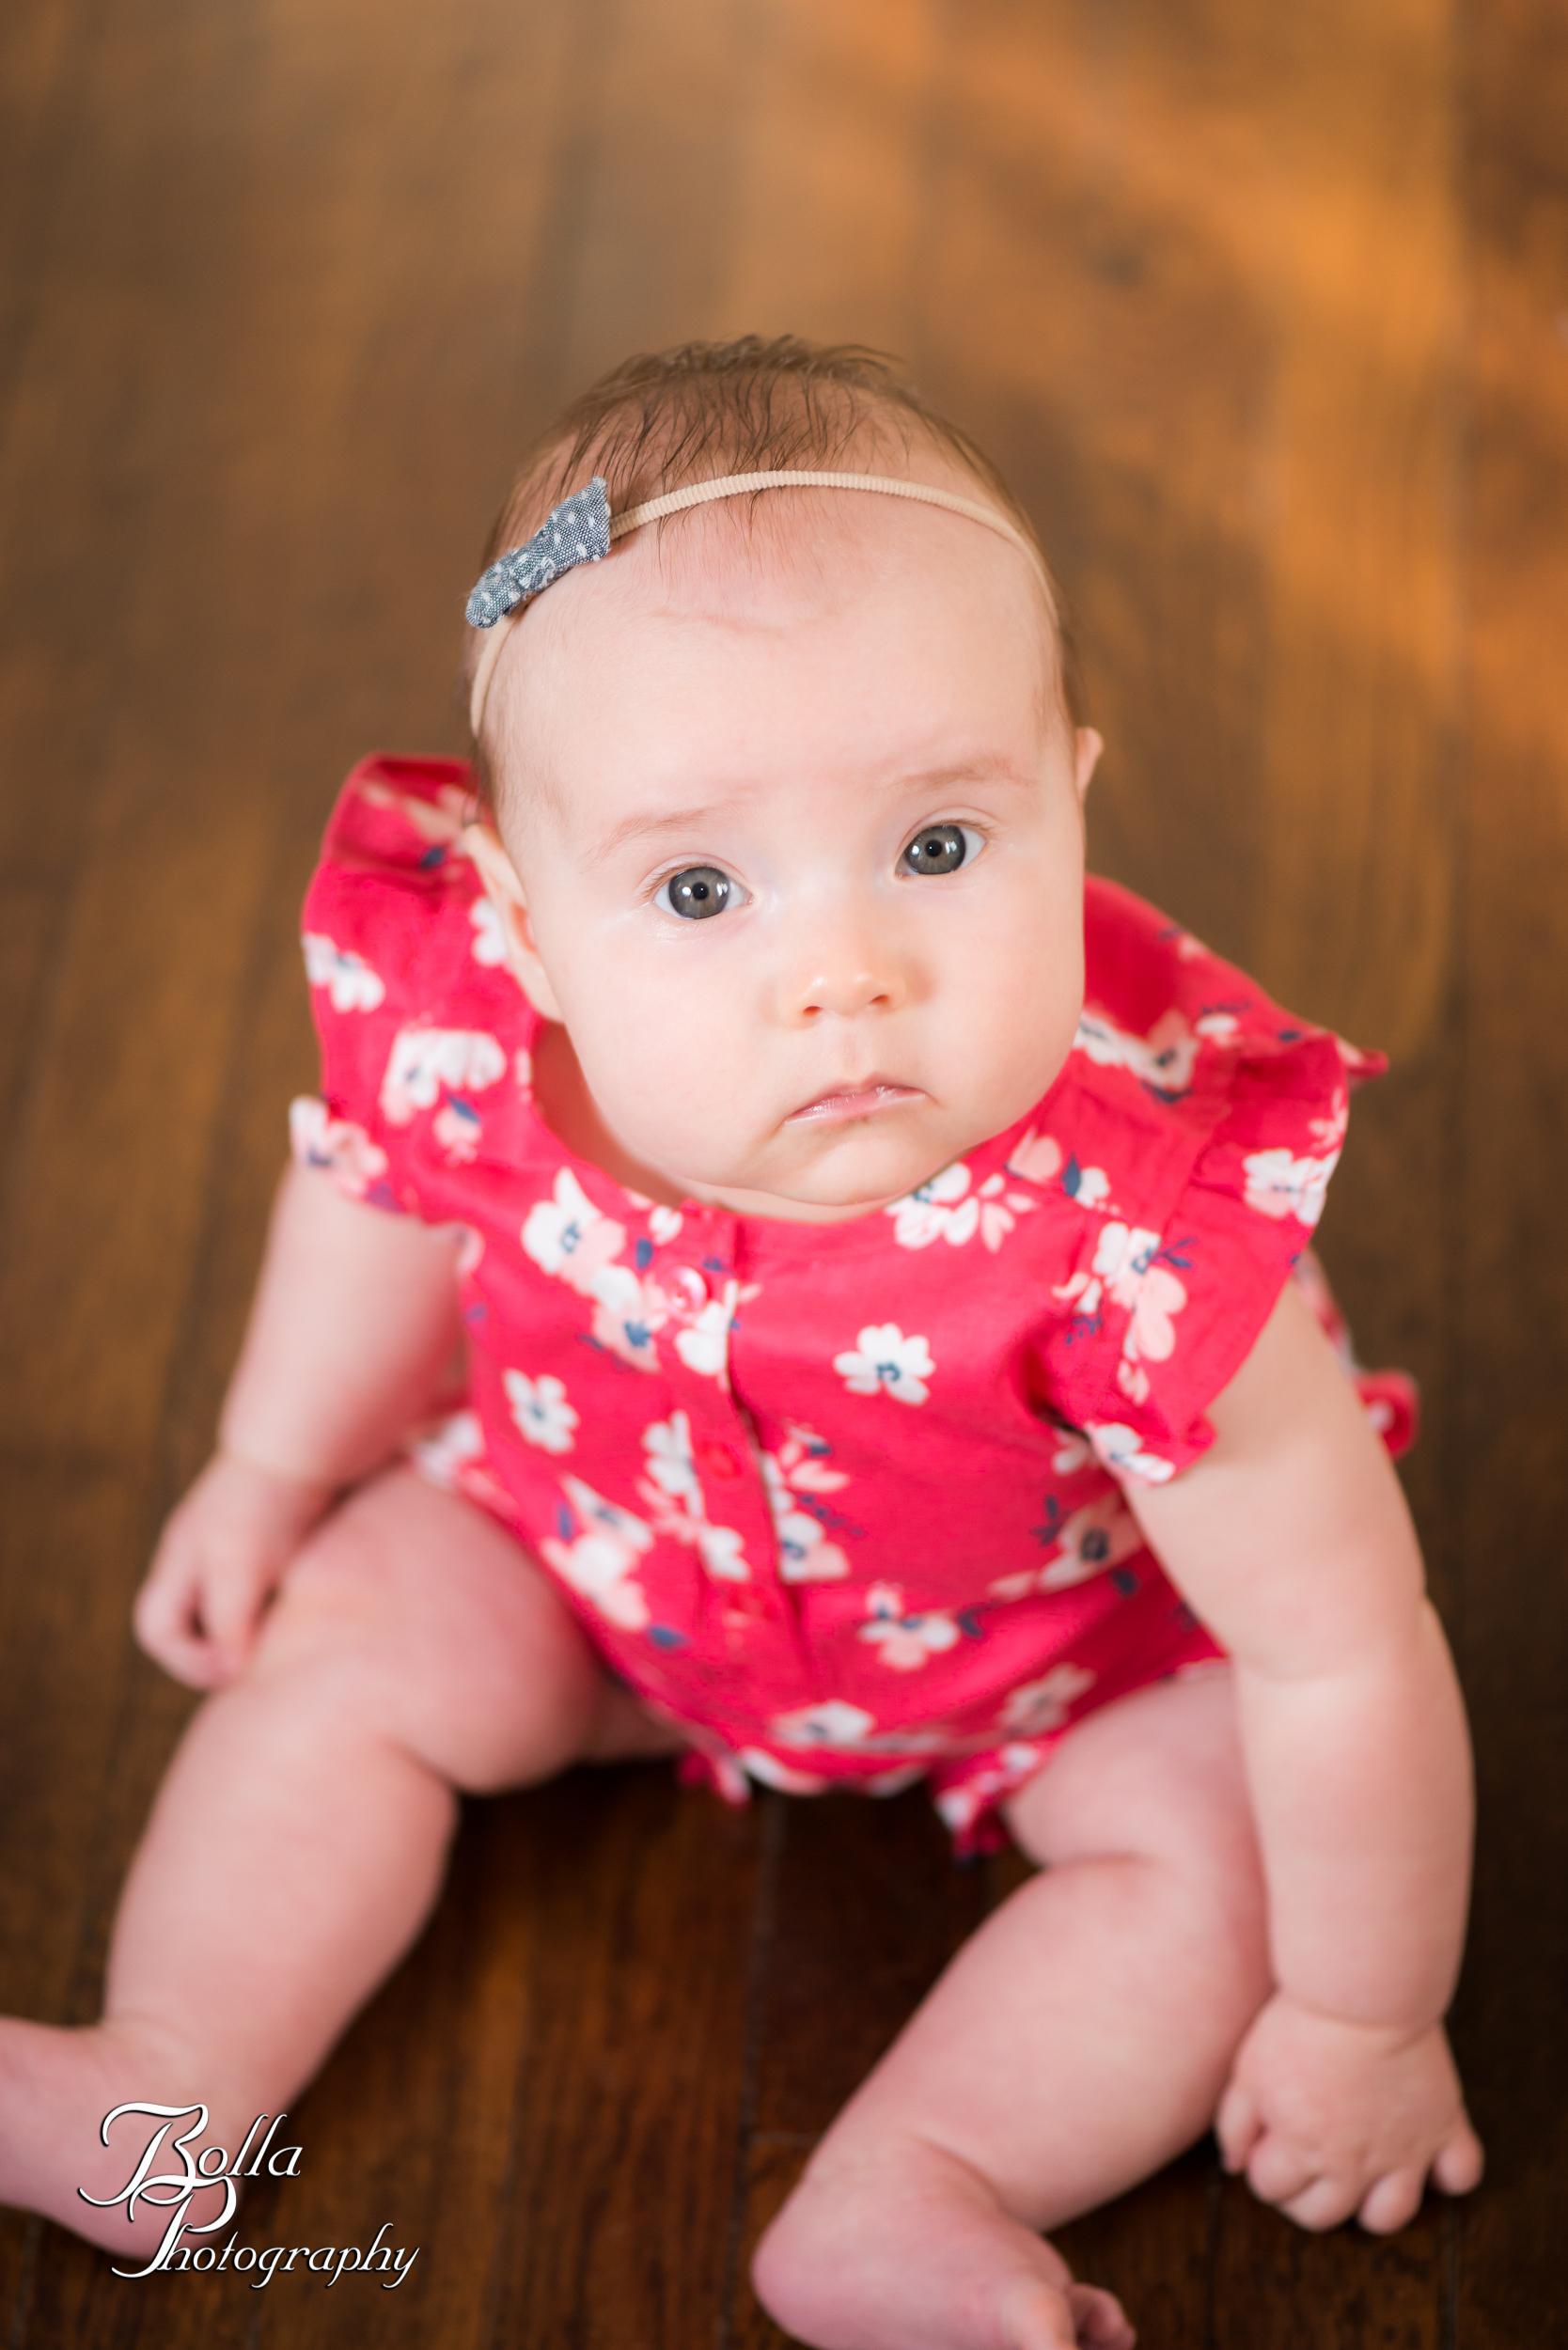 20170122_Bolla photography edwardsville wedding newborn baby photographer st louis weddings babies-0003.jpg